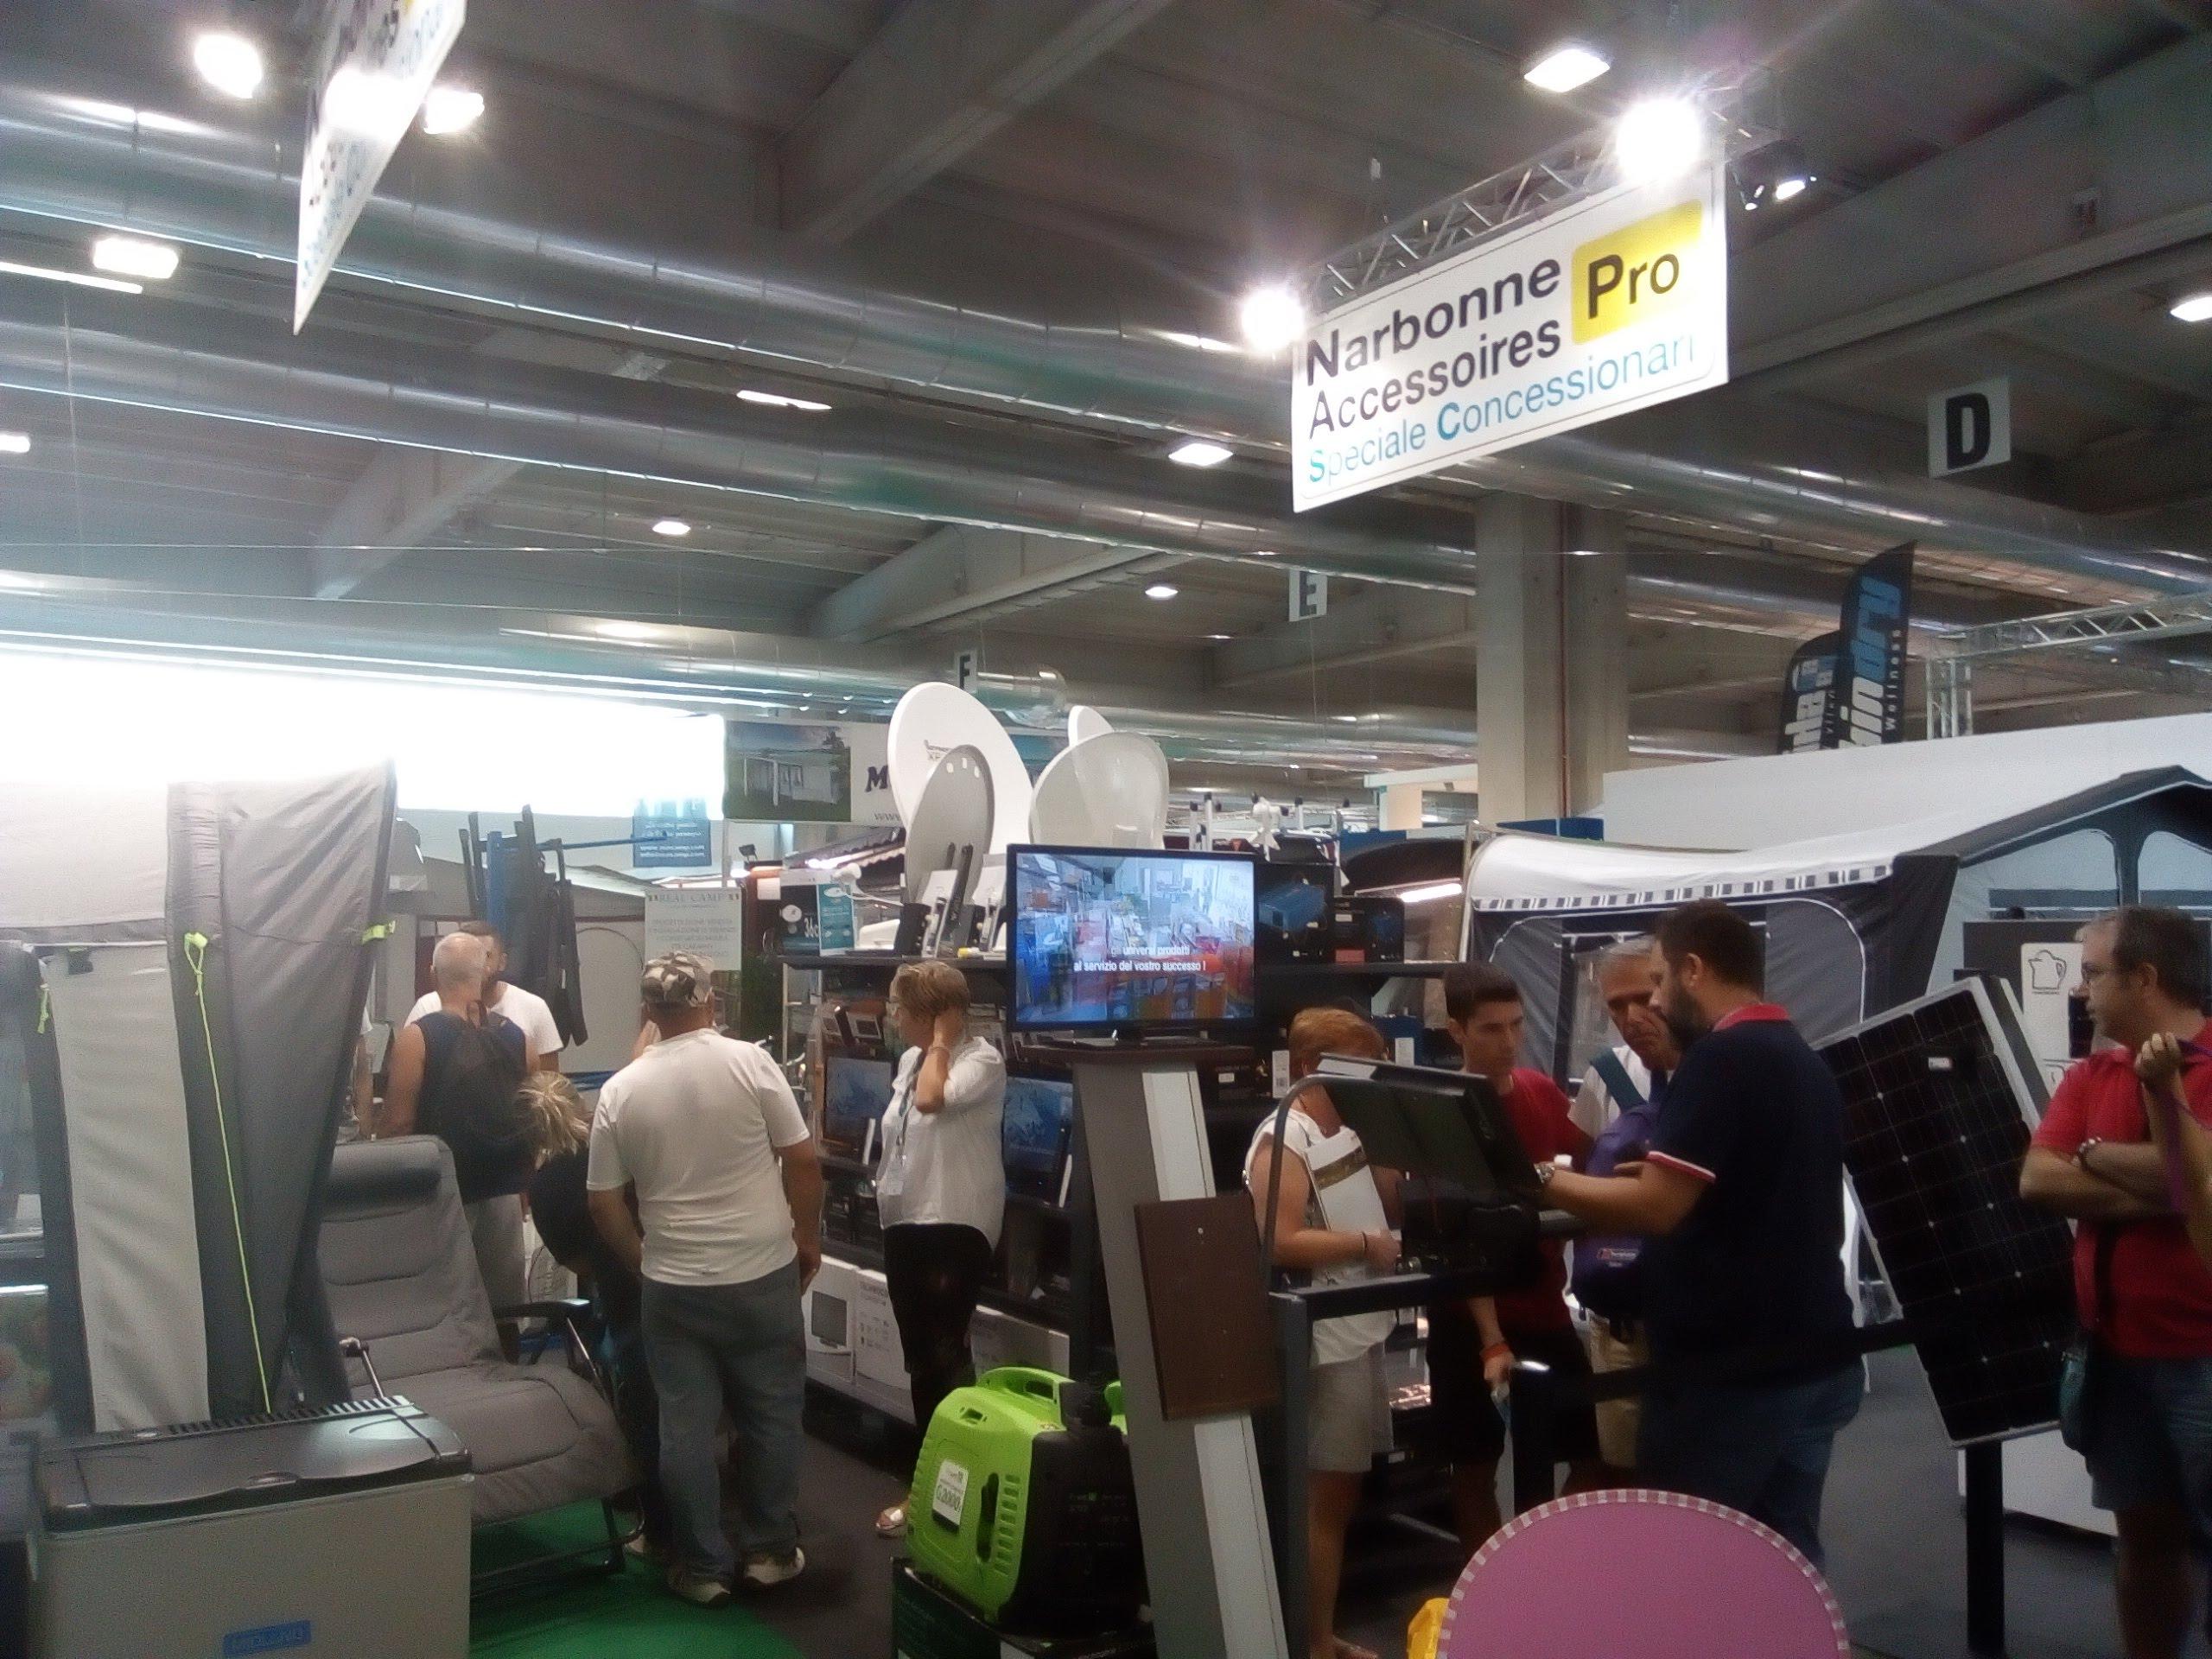 Autonord Car & Caravan al Salone del Camper 2018 con Narbonne Accessoires